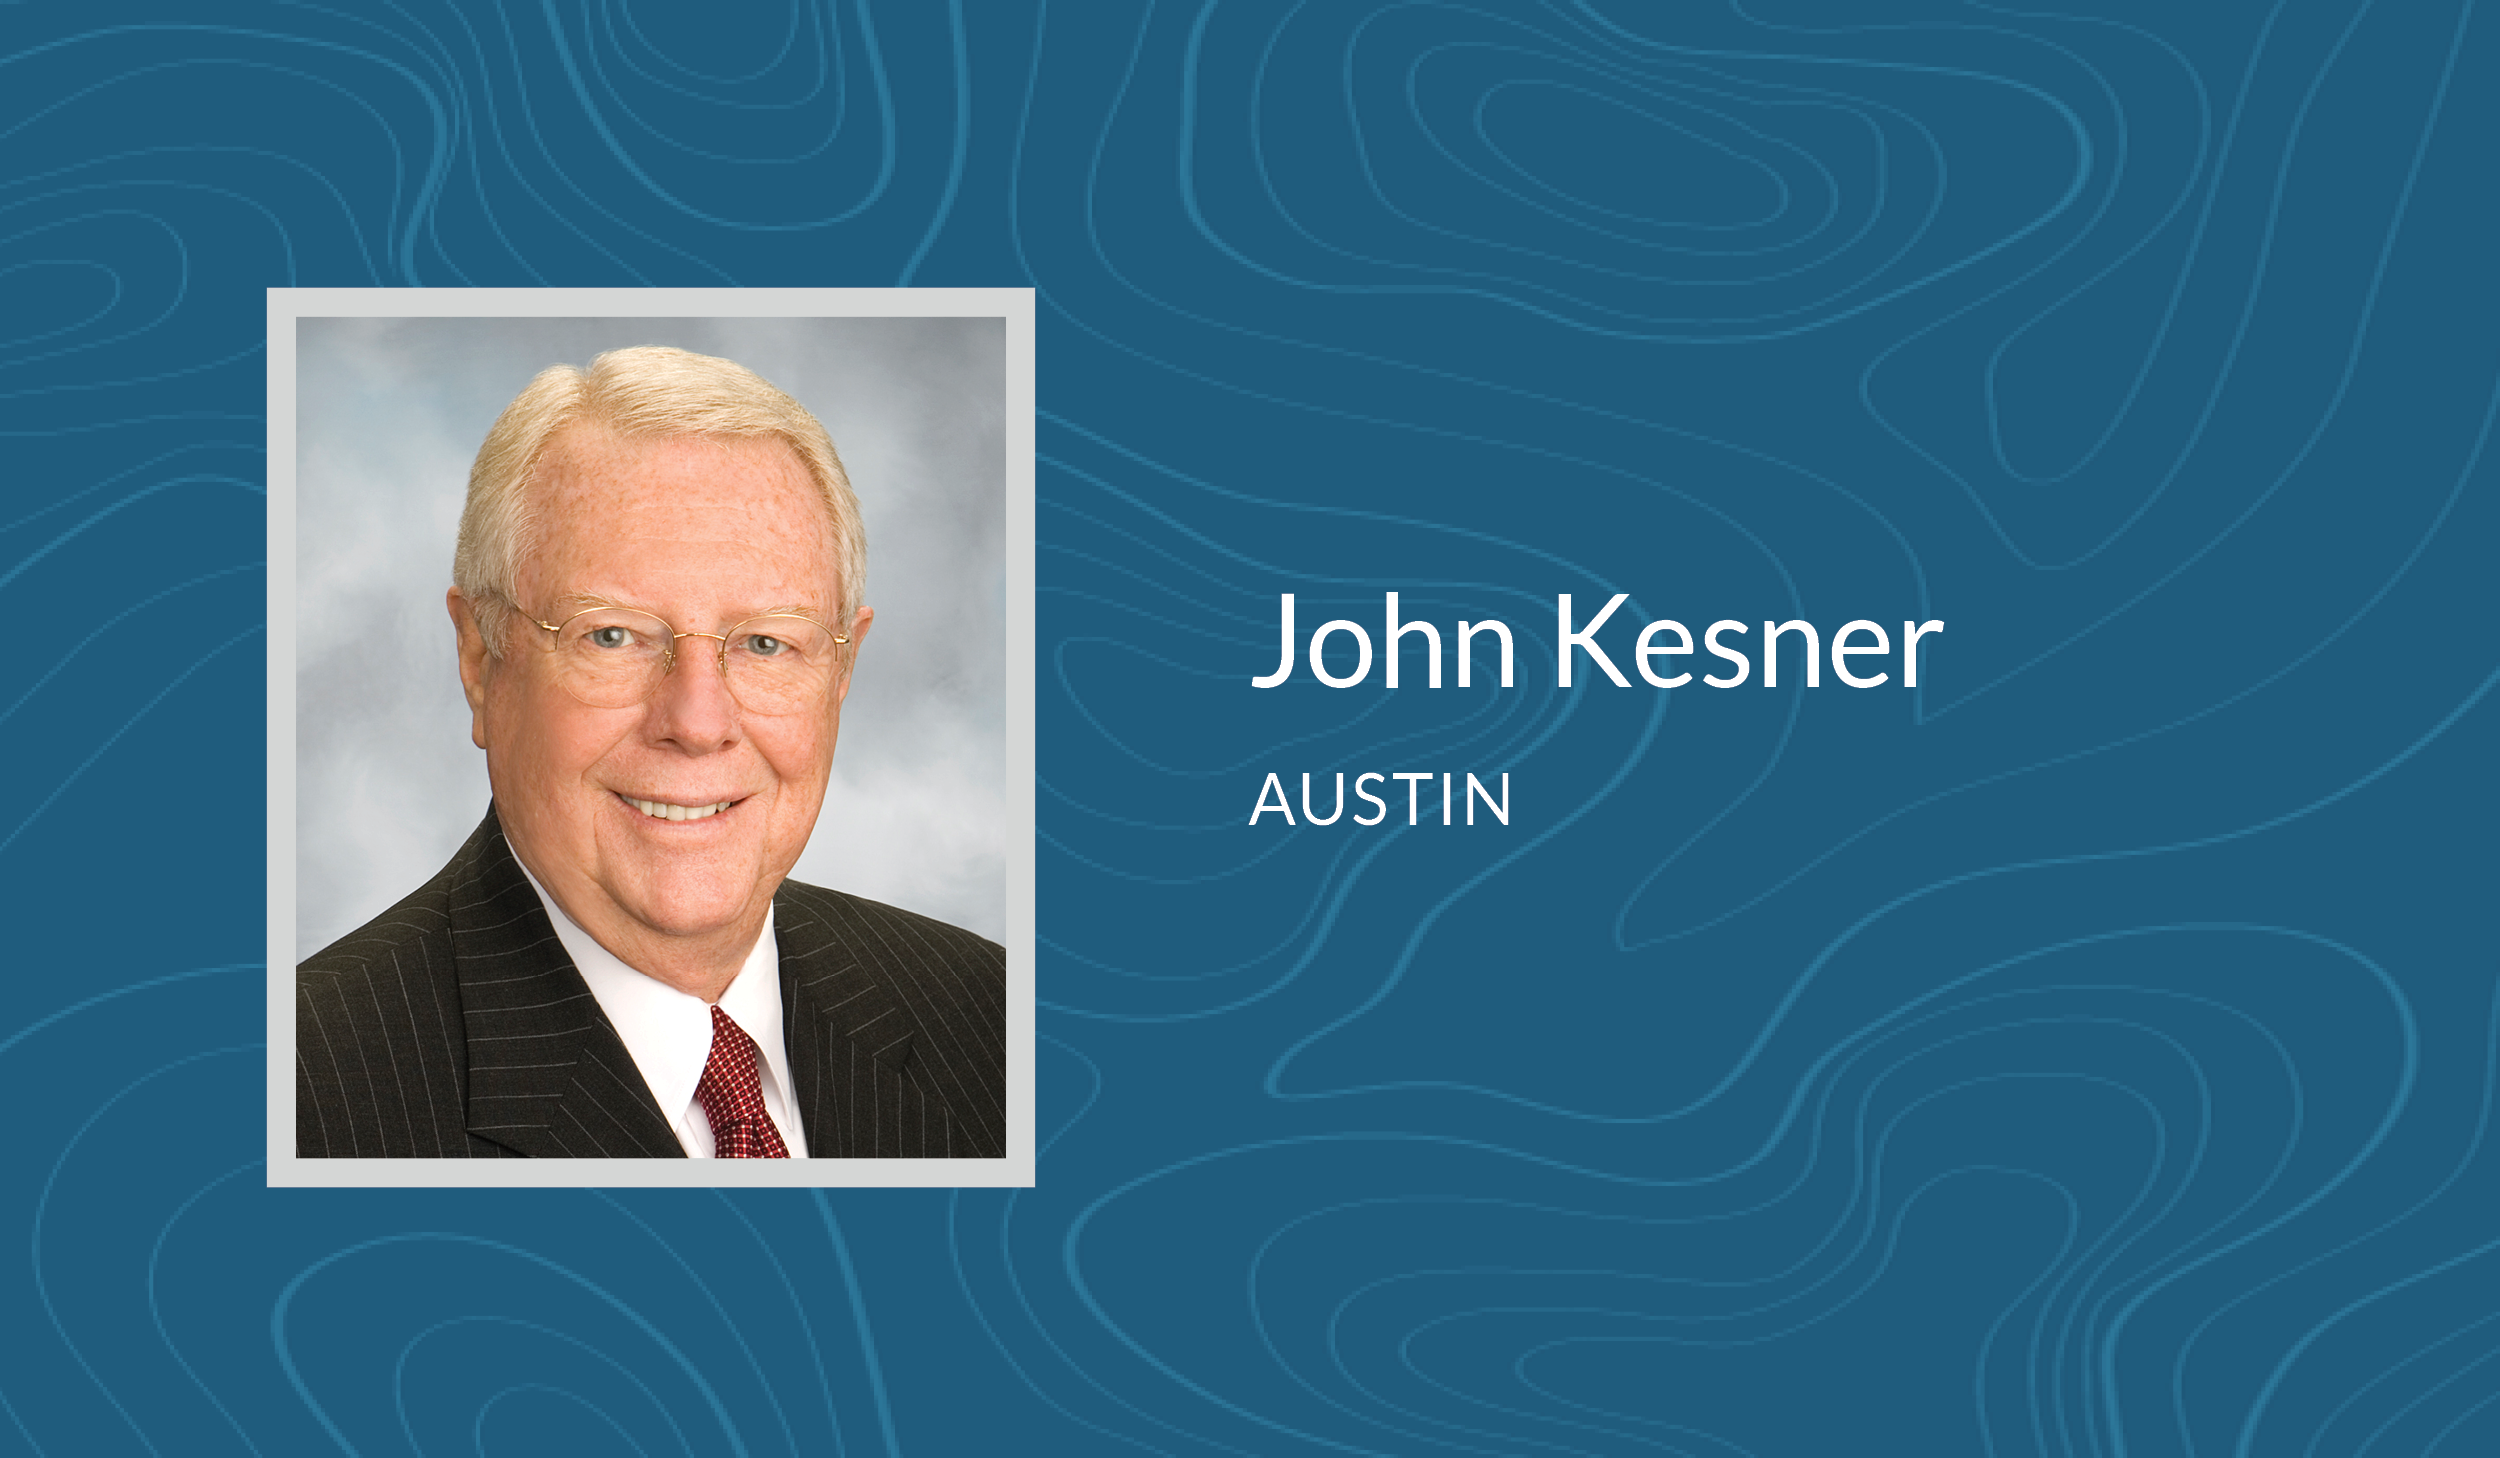 John Kesner Landing Page Headers.png